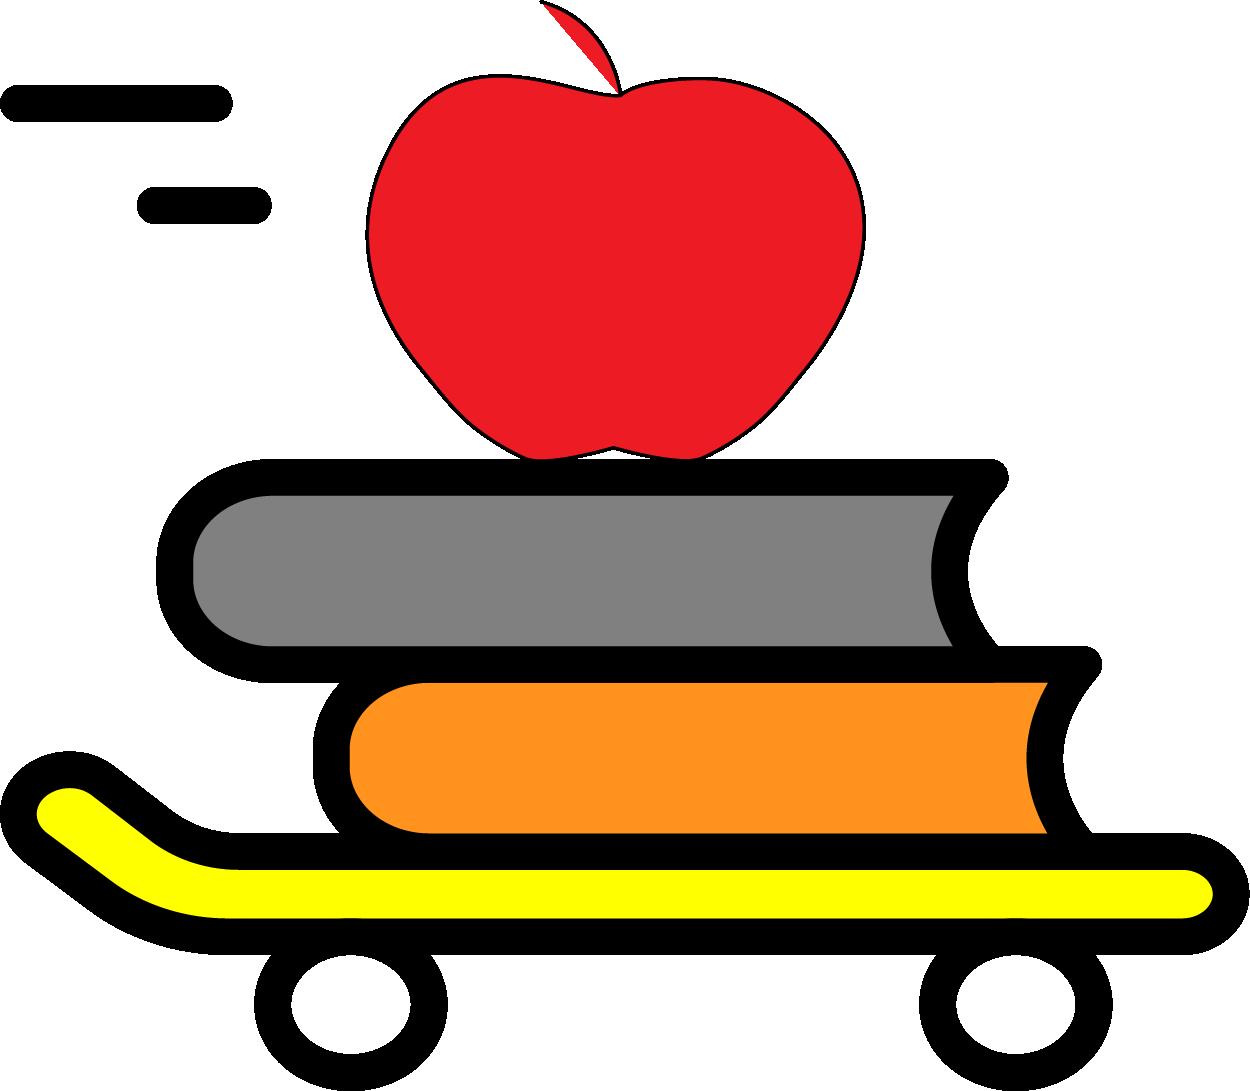 resources logo filled